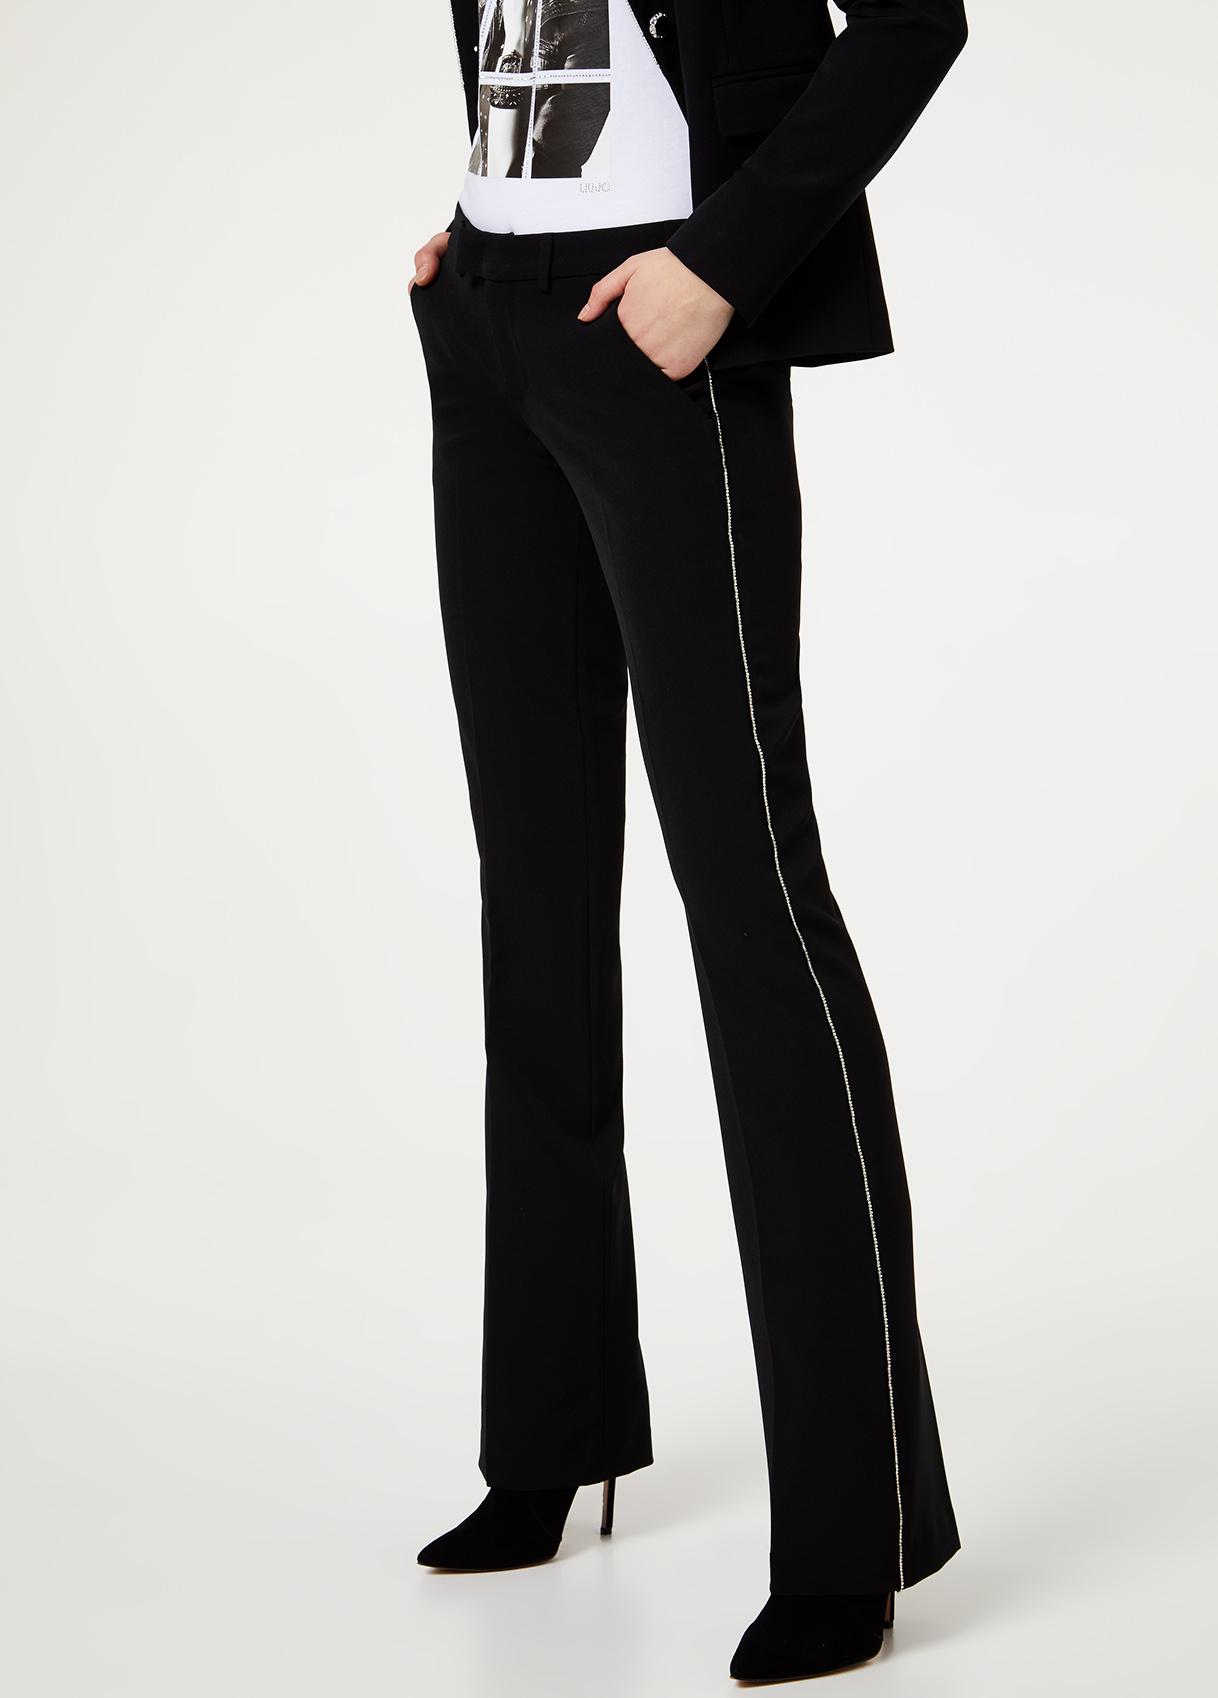 Pantalone elegante bootcut Nero Liu Jo - large